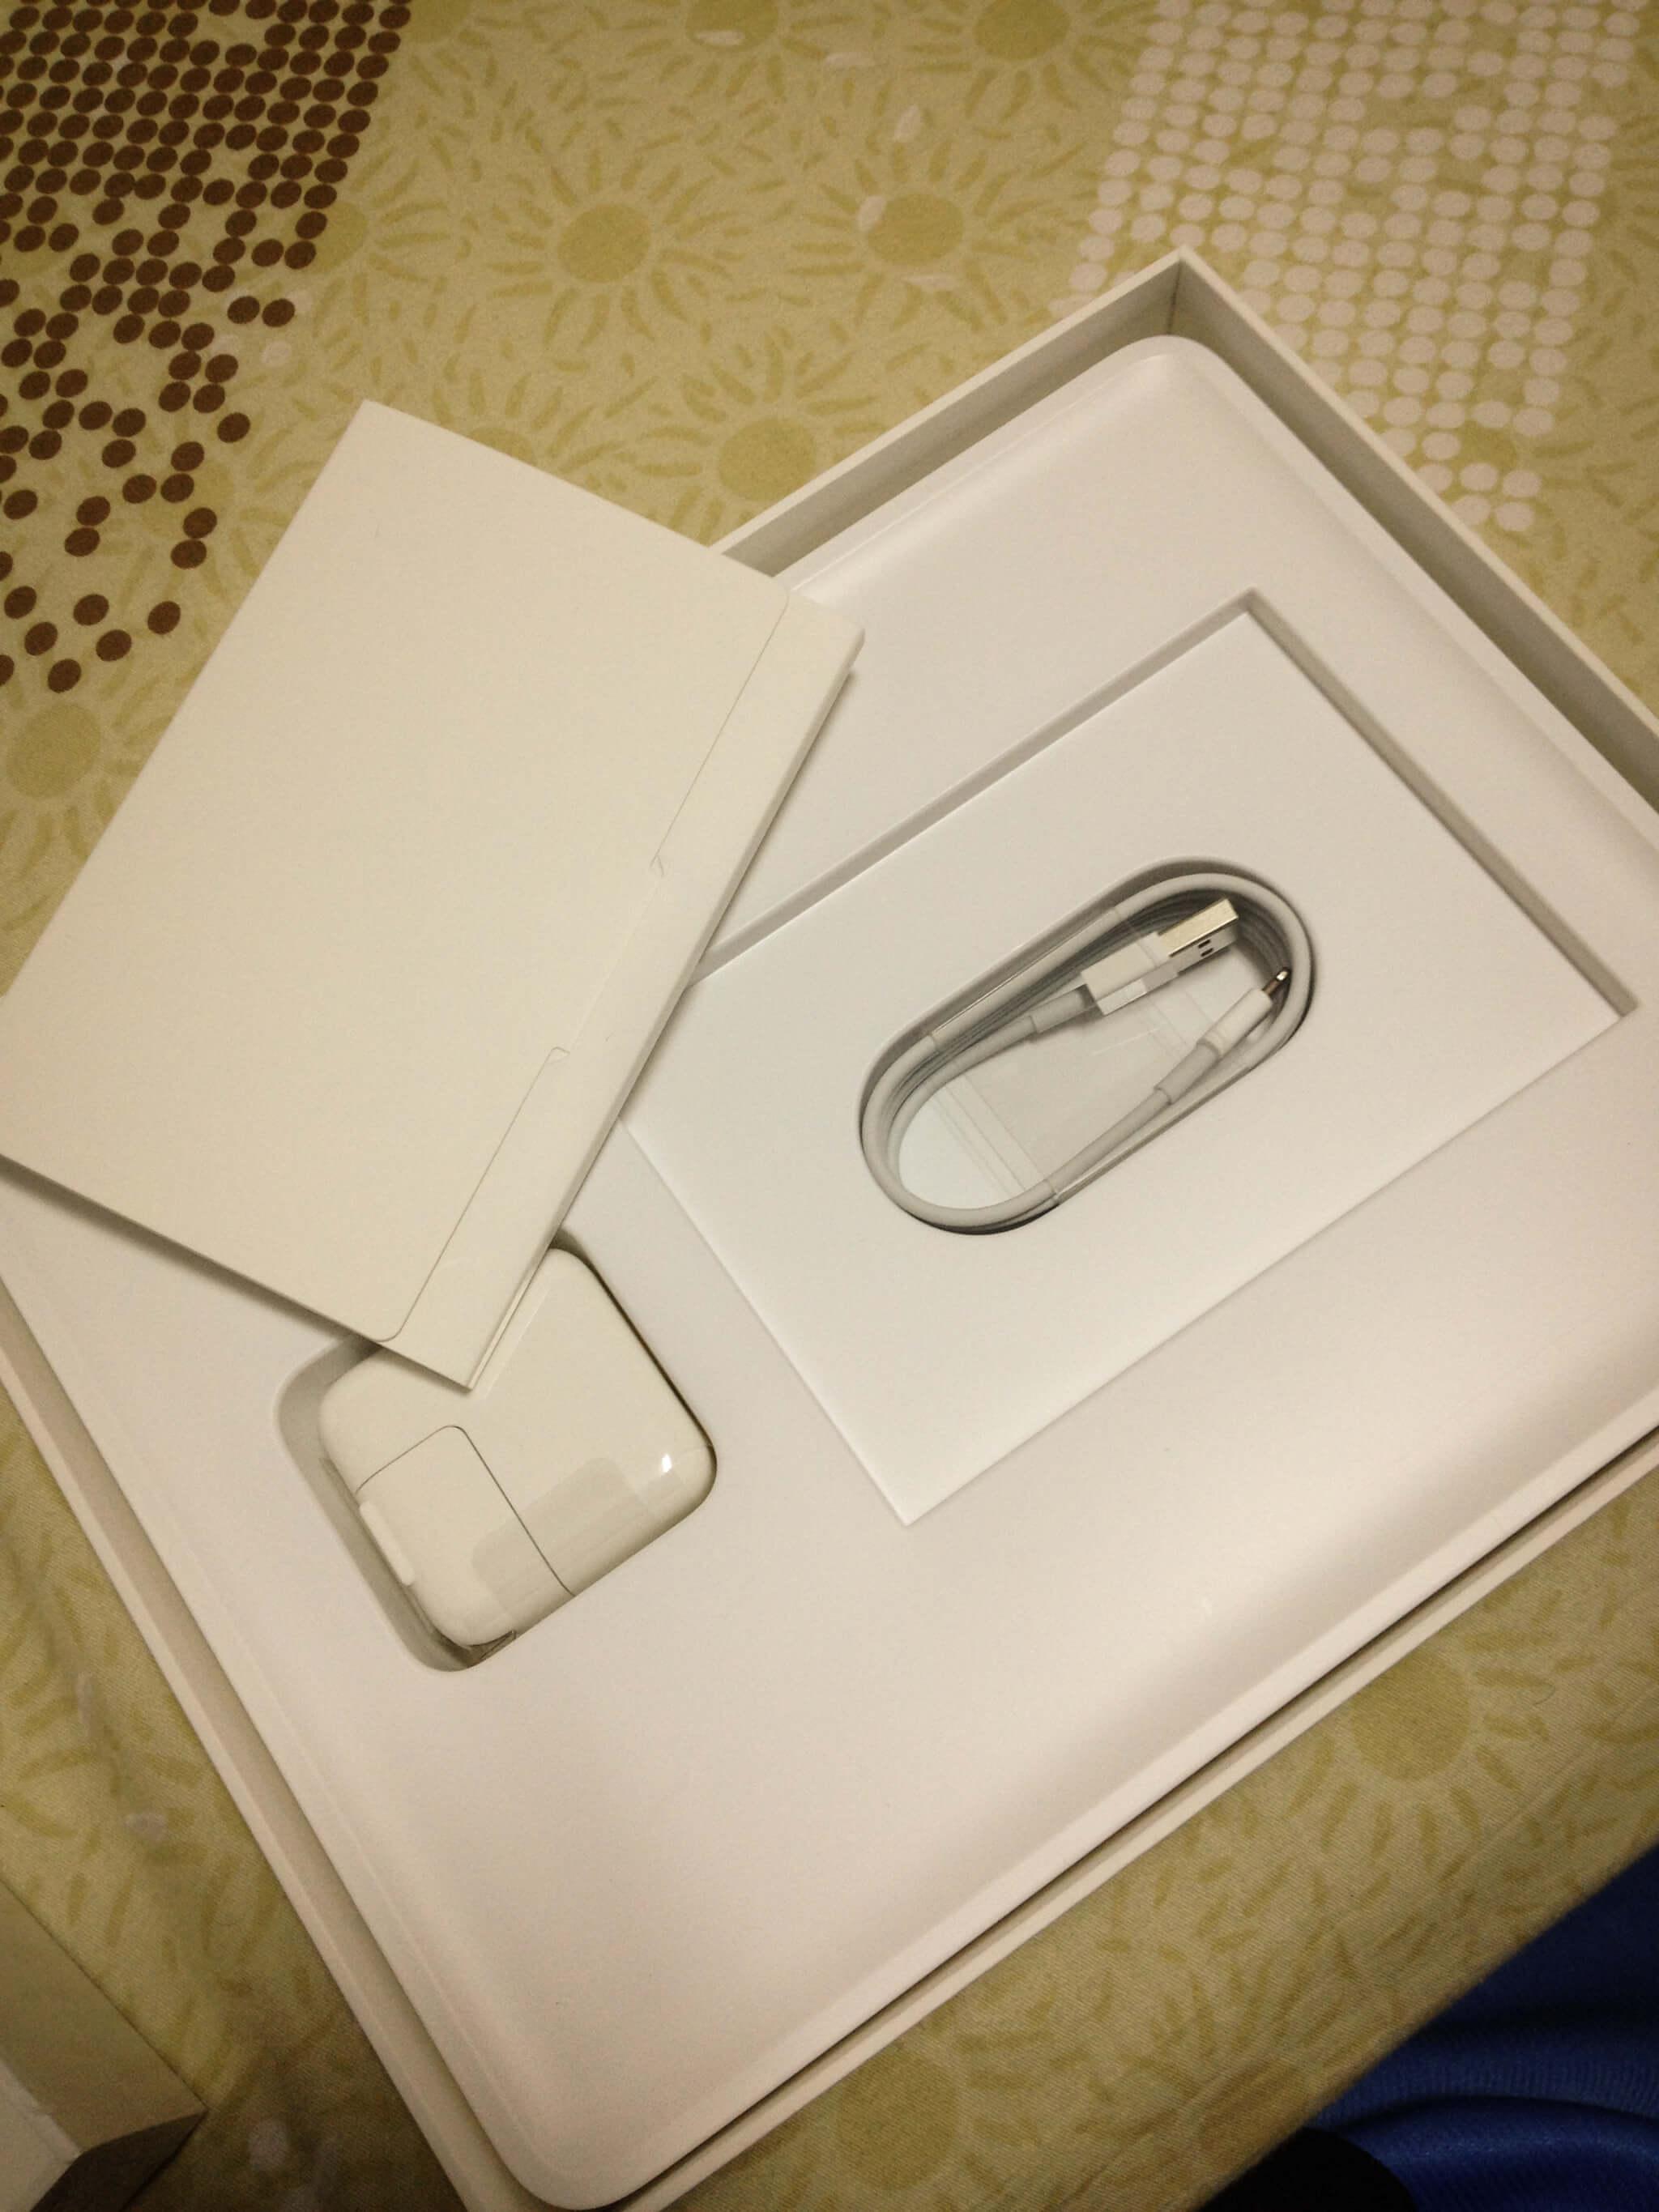 iPad 的配件,說明書、白豆腐、USB 傳輸線